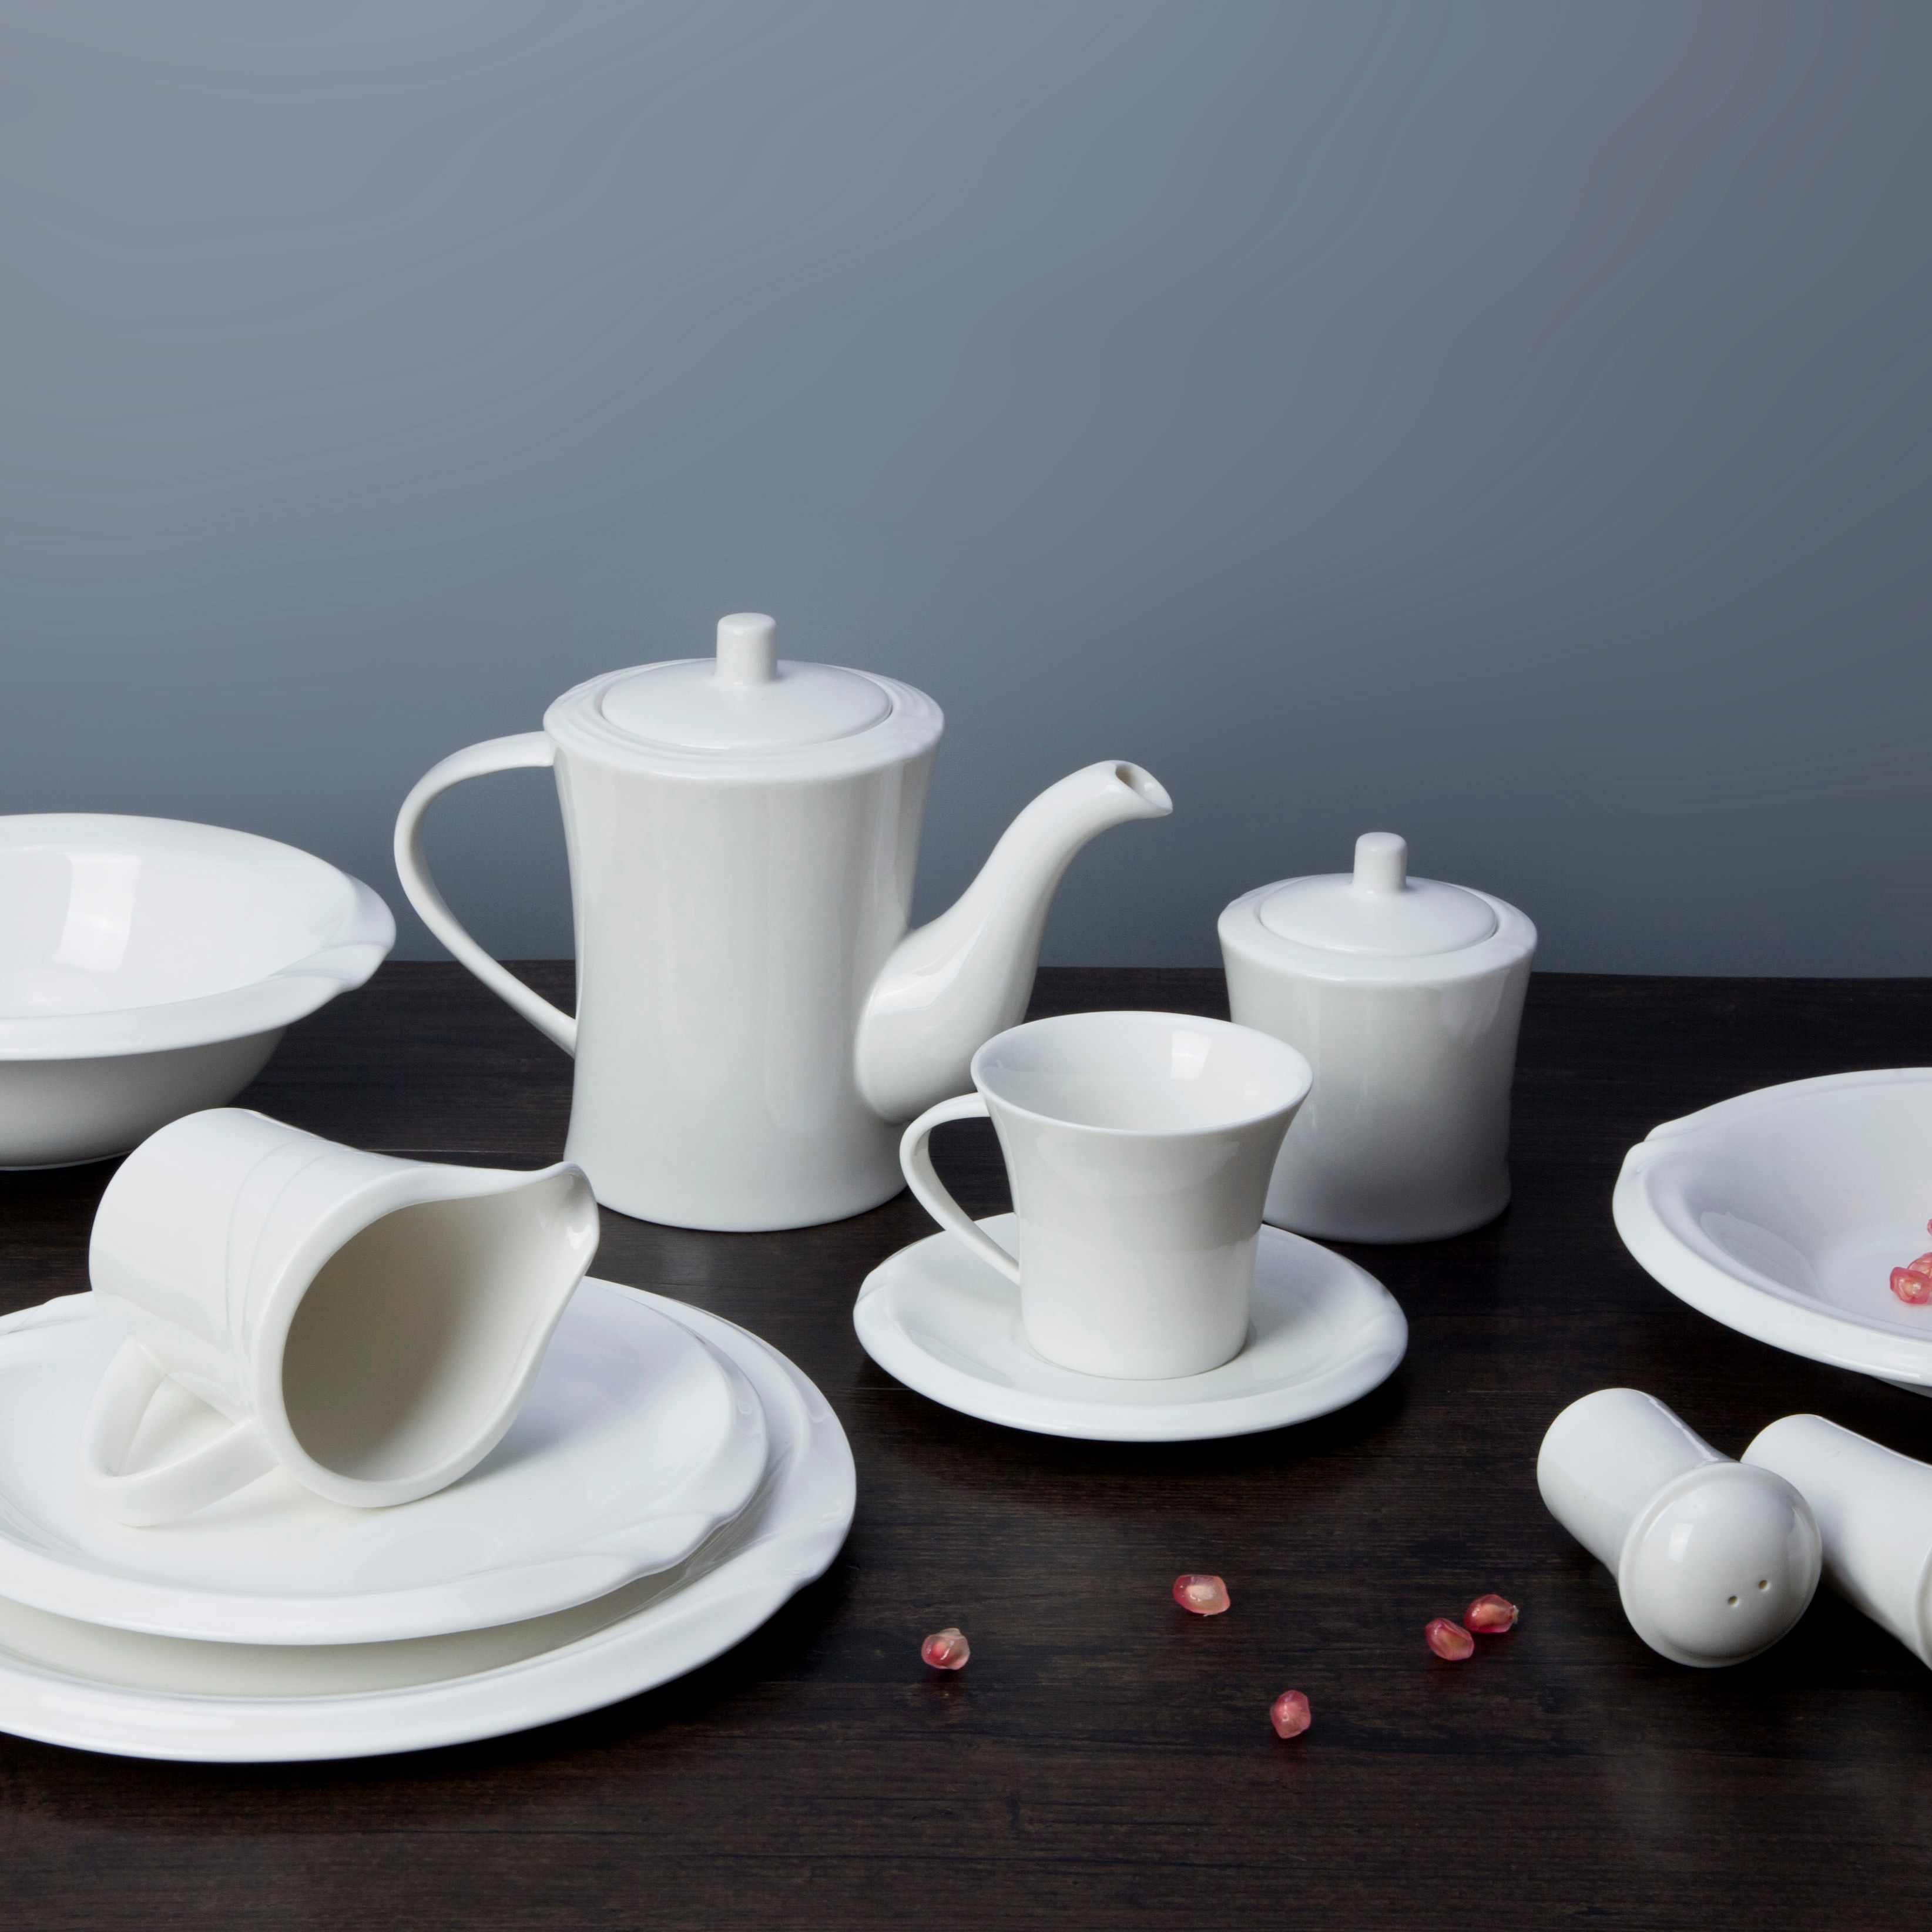 Two Eight White ceramic dinnerware set - XUAN WEN SERIES White Porcelain Dinner Set image12